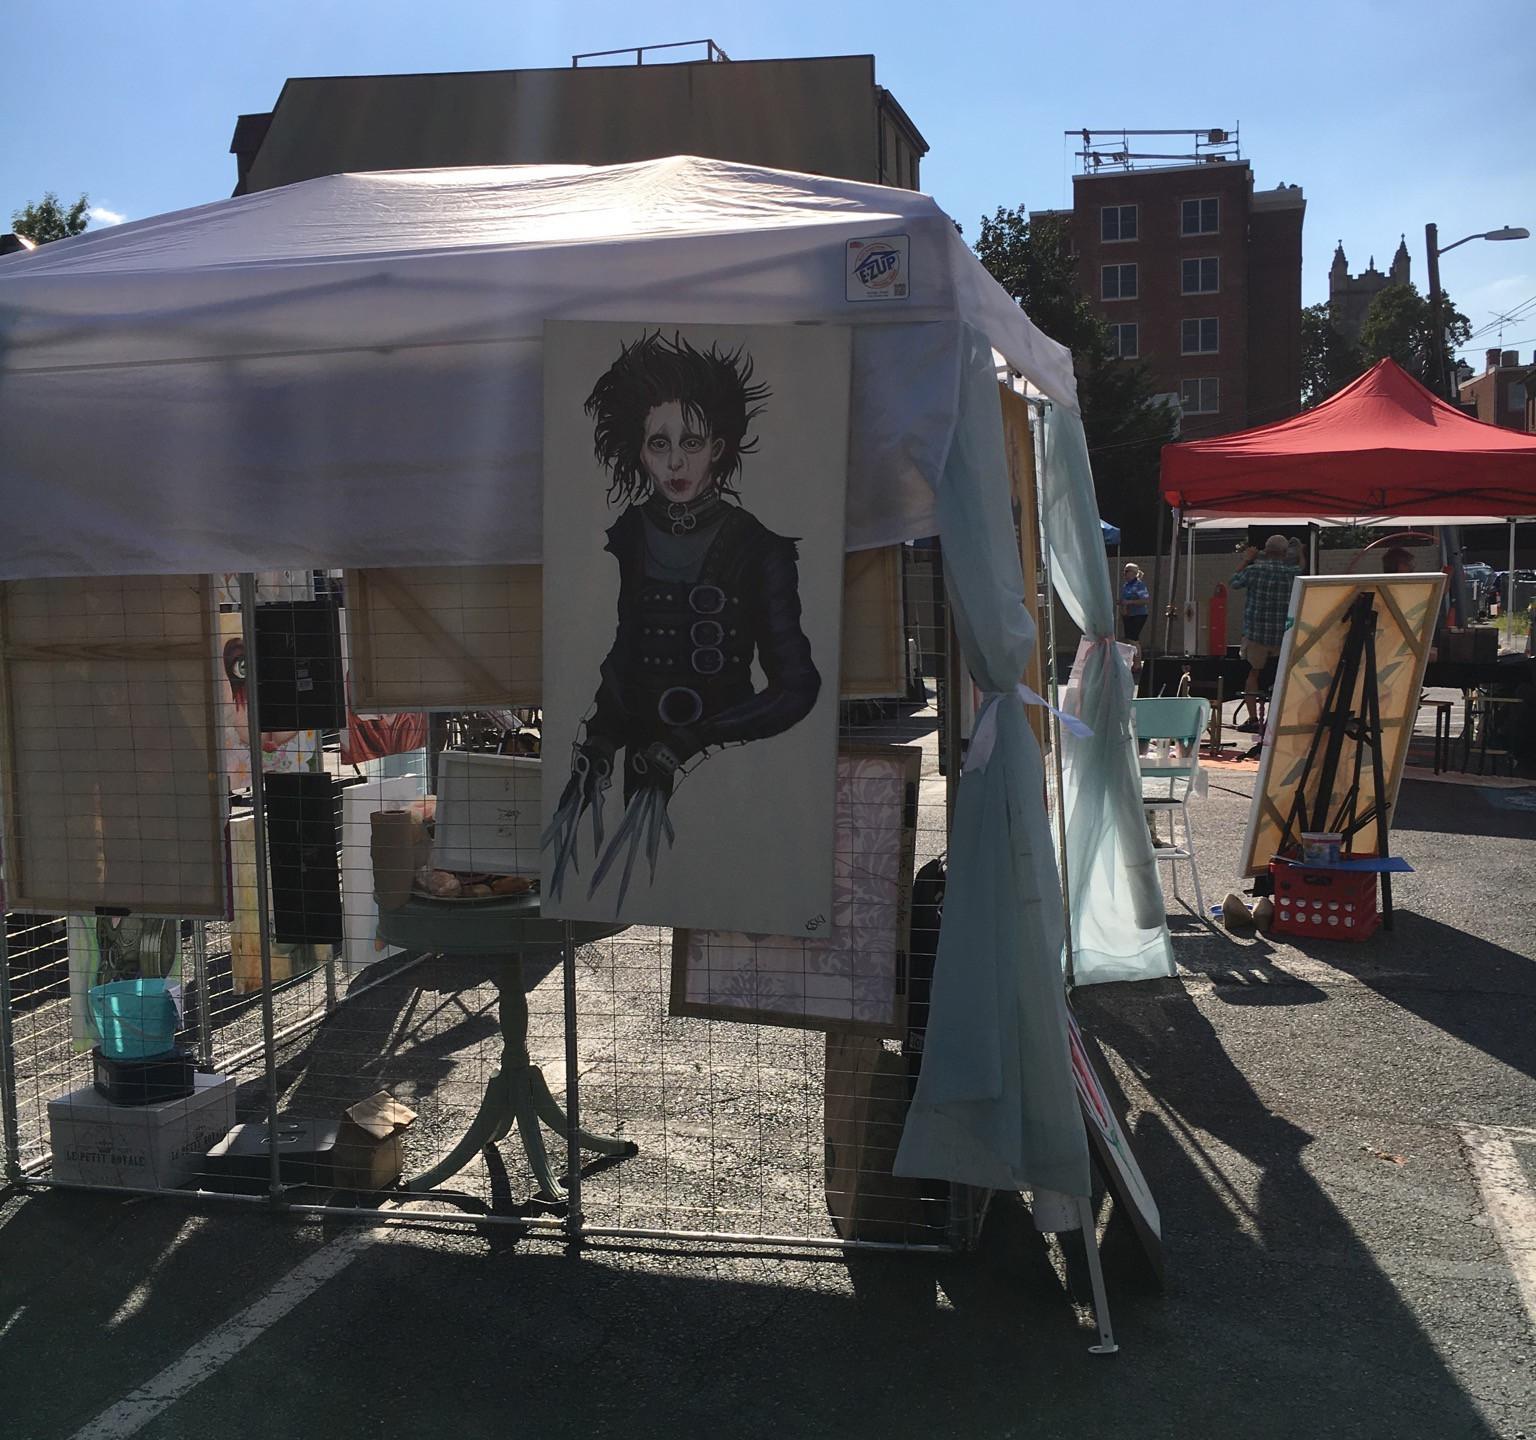 Krissy Whiski Art Show tent craft fair booth fine art paintings edward scissorhands tim buron dc art rave